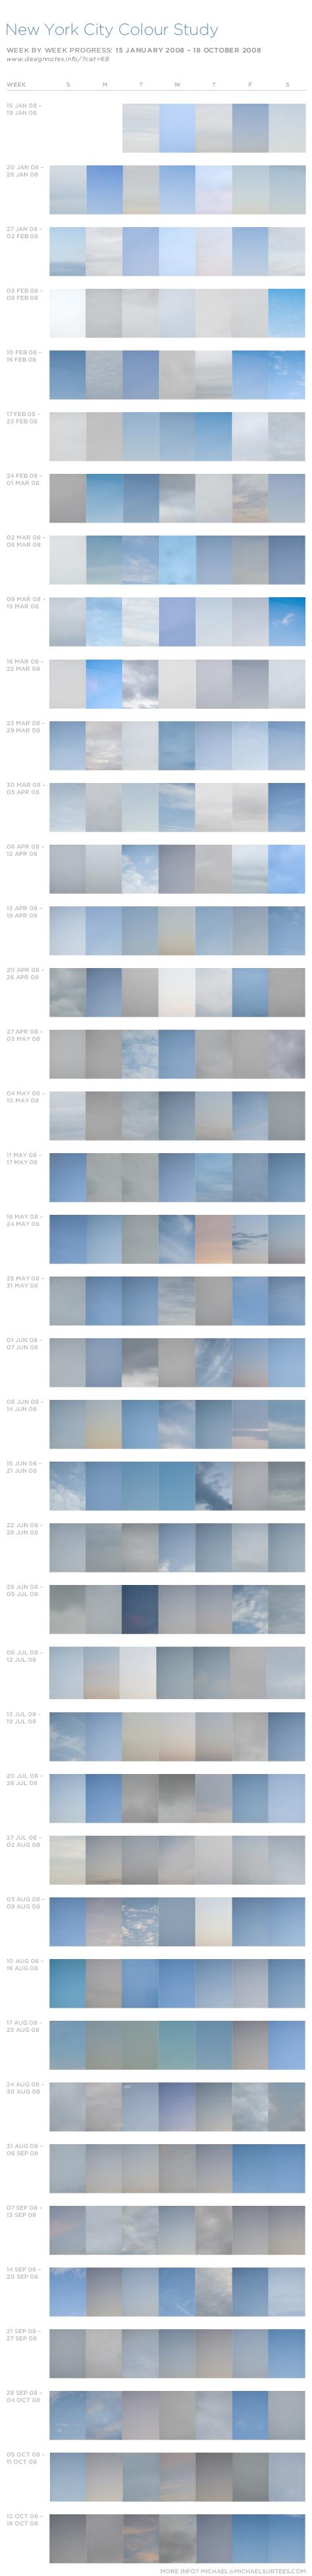 New York City Colour Study Week By Week Progress